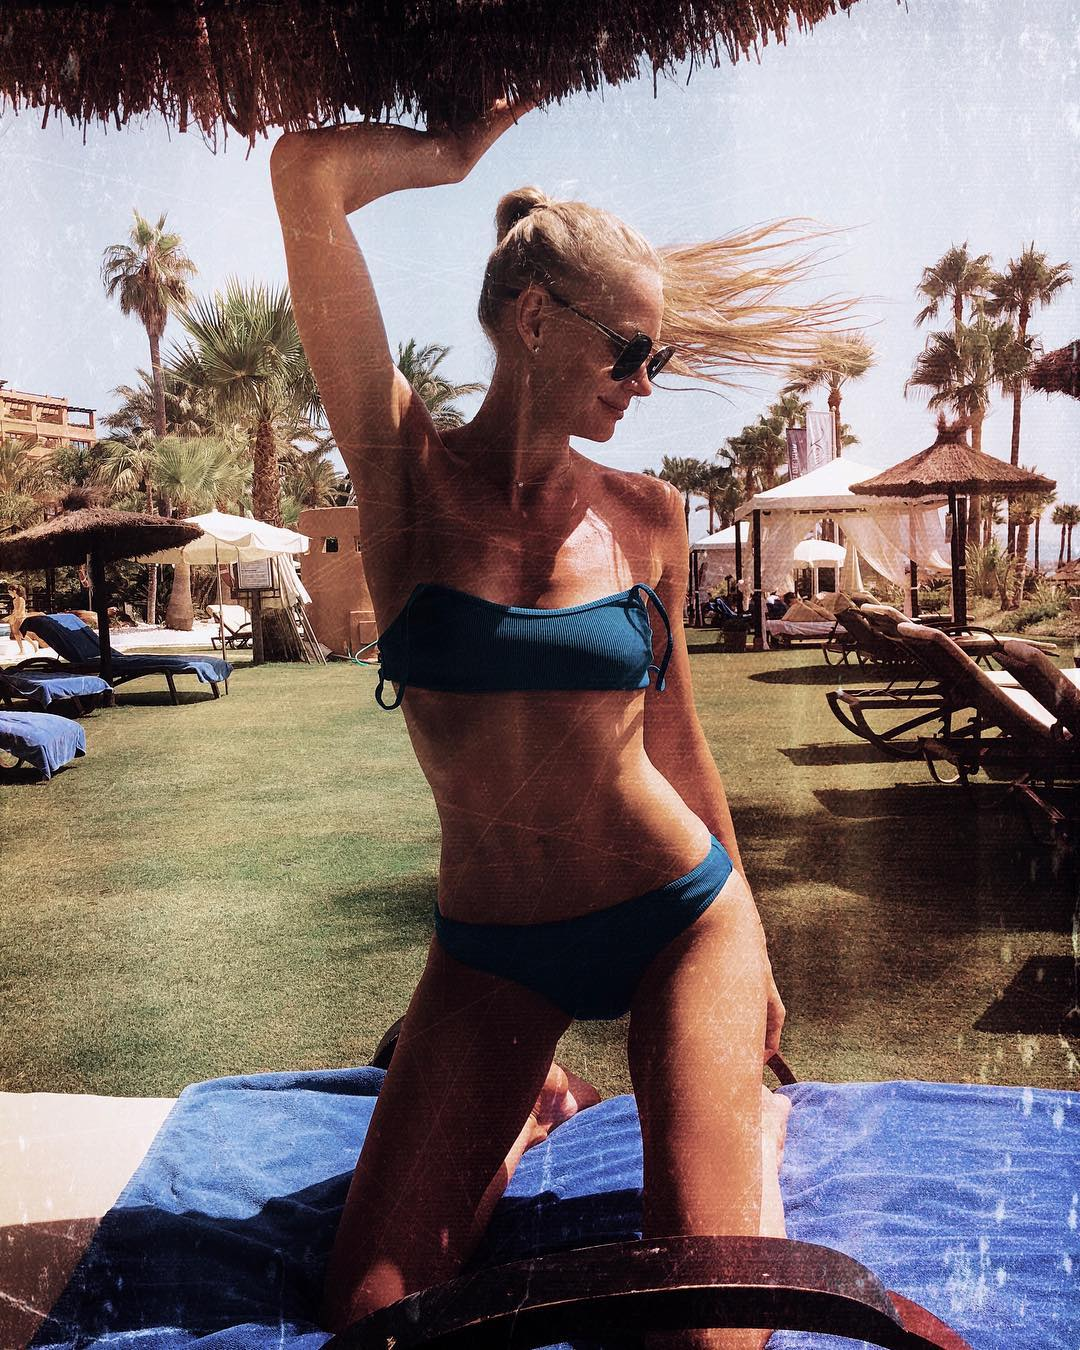 «Тело — мечта!»: Светлана Ходченкова сразила откровенными фото из отпуска